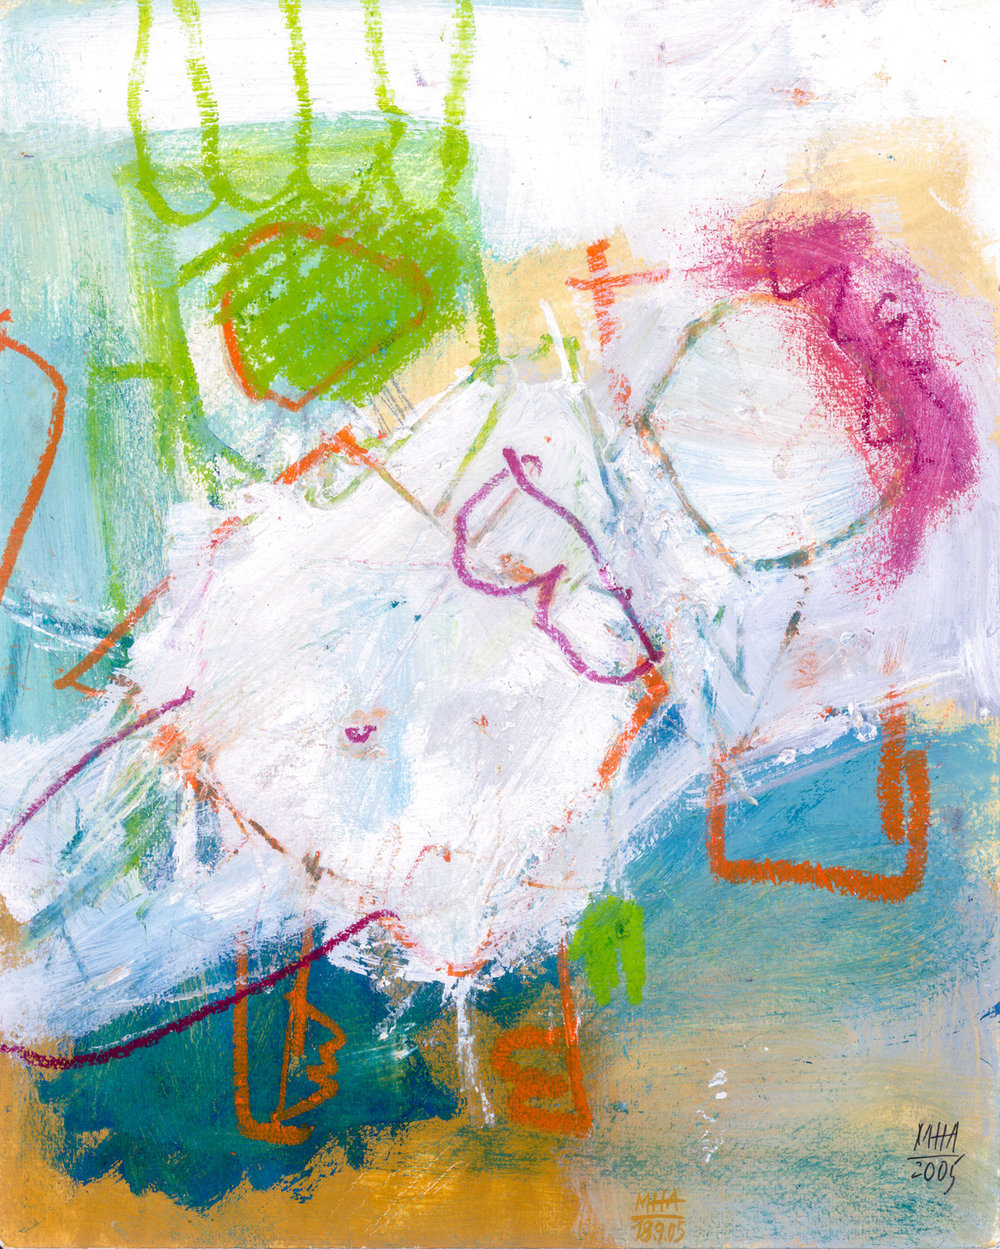 15  BEGLÜCKT, 2005, Acryl auf Papier, 24x30 cm